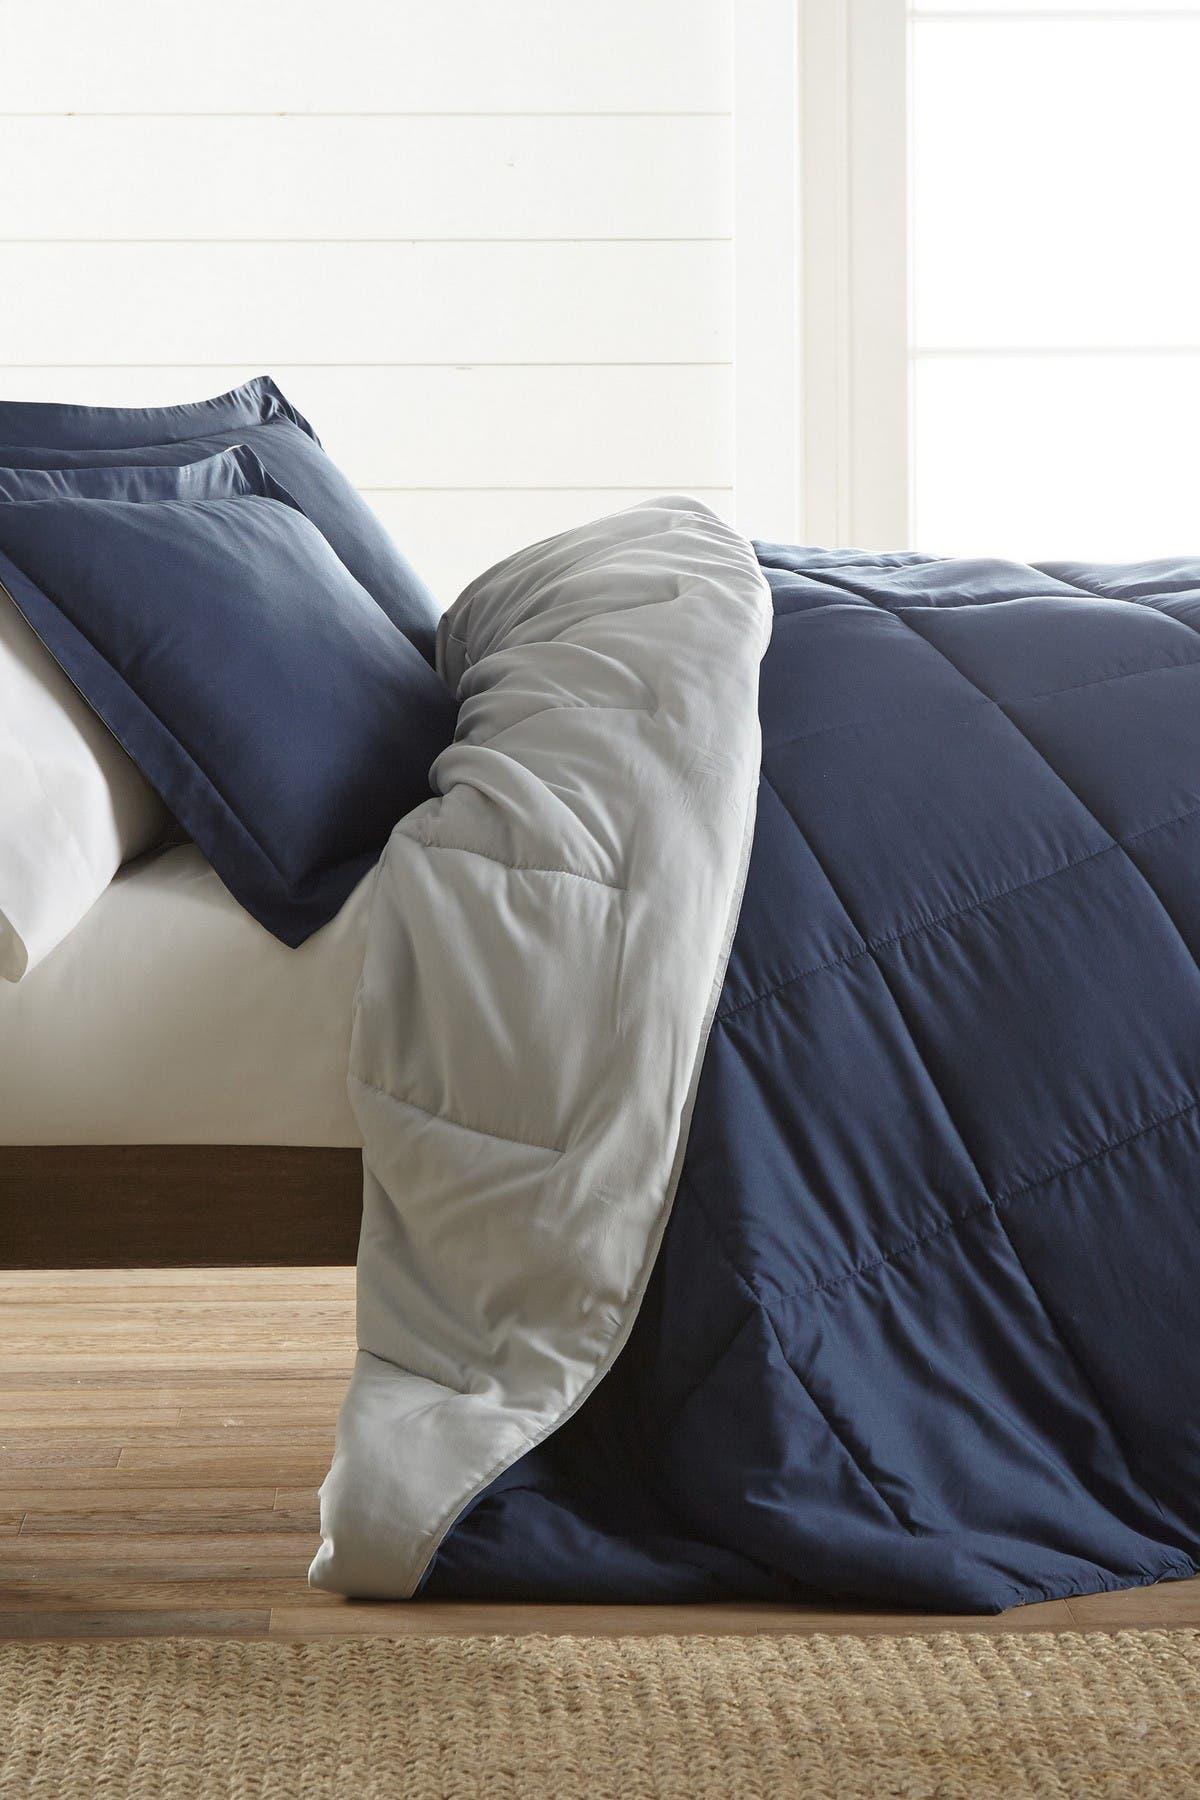 Image of IENJOY HOME Treat Yourself To The Ultimate Down Alternative Reversible 3-Piece Comforter Set - Navy - Queen